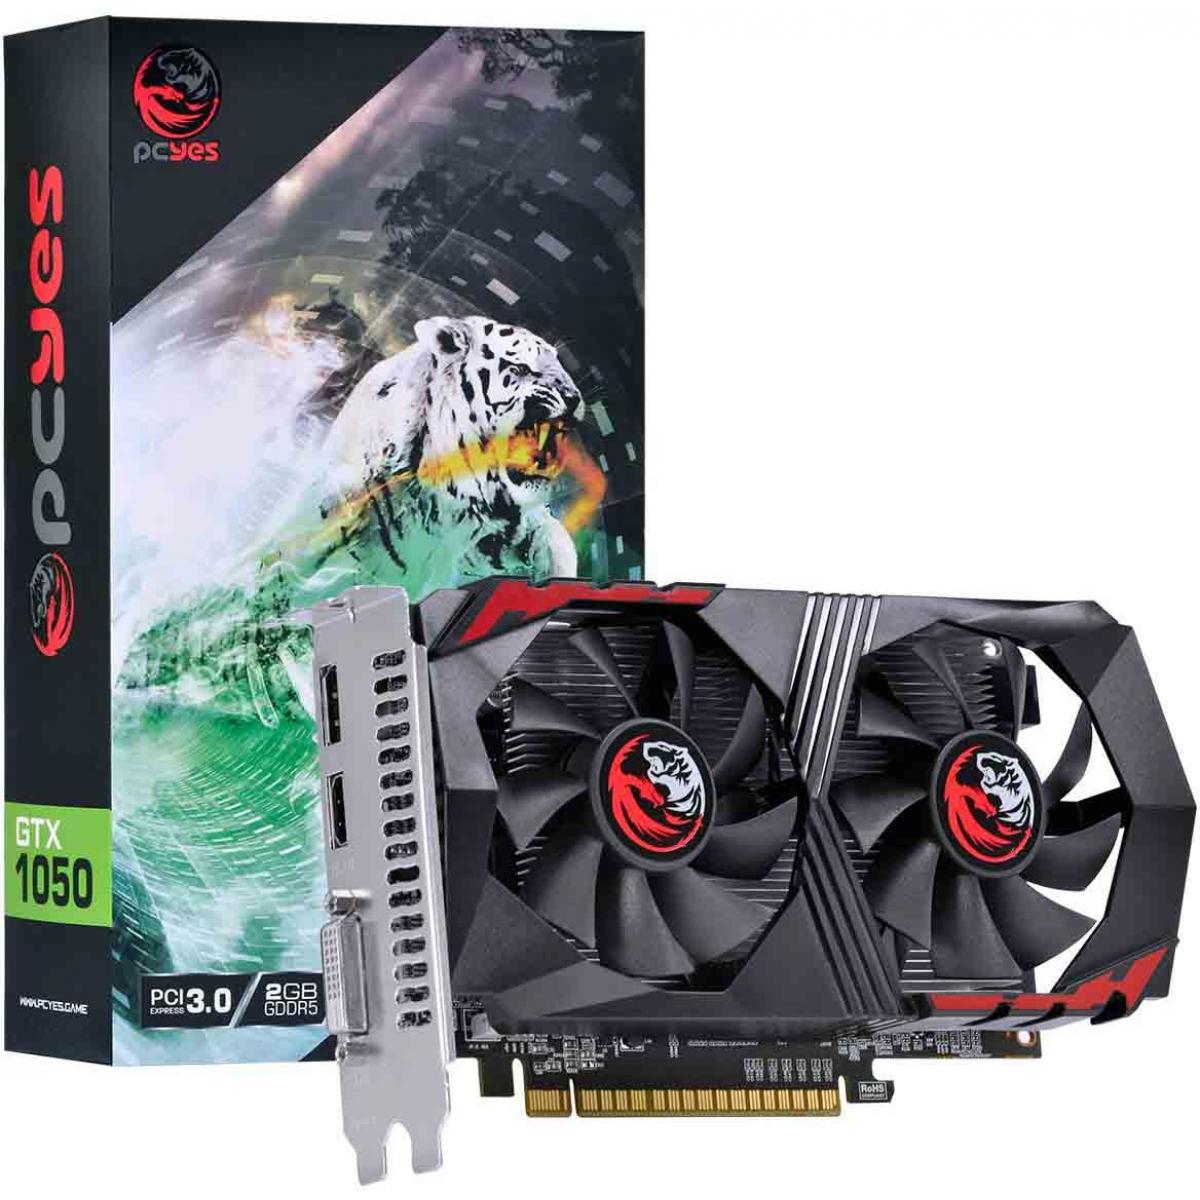 Placa de Vídeo PCYES GeForce GTX 1050 Dual, 2GB GDDR5, 128Bit, PA1050GTX12802G5